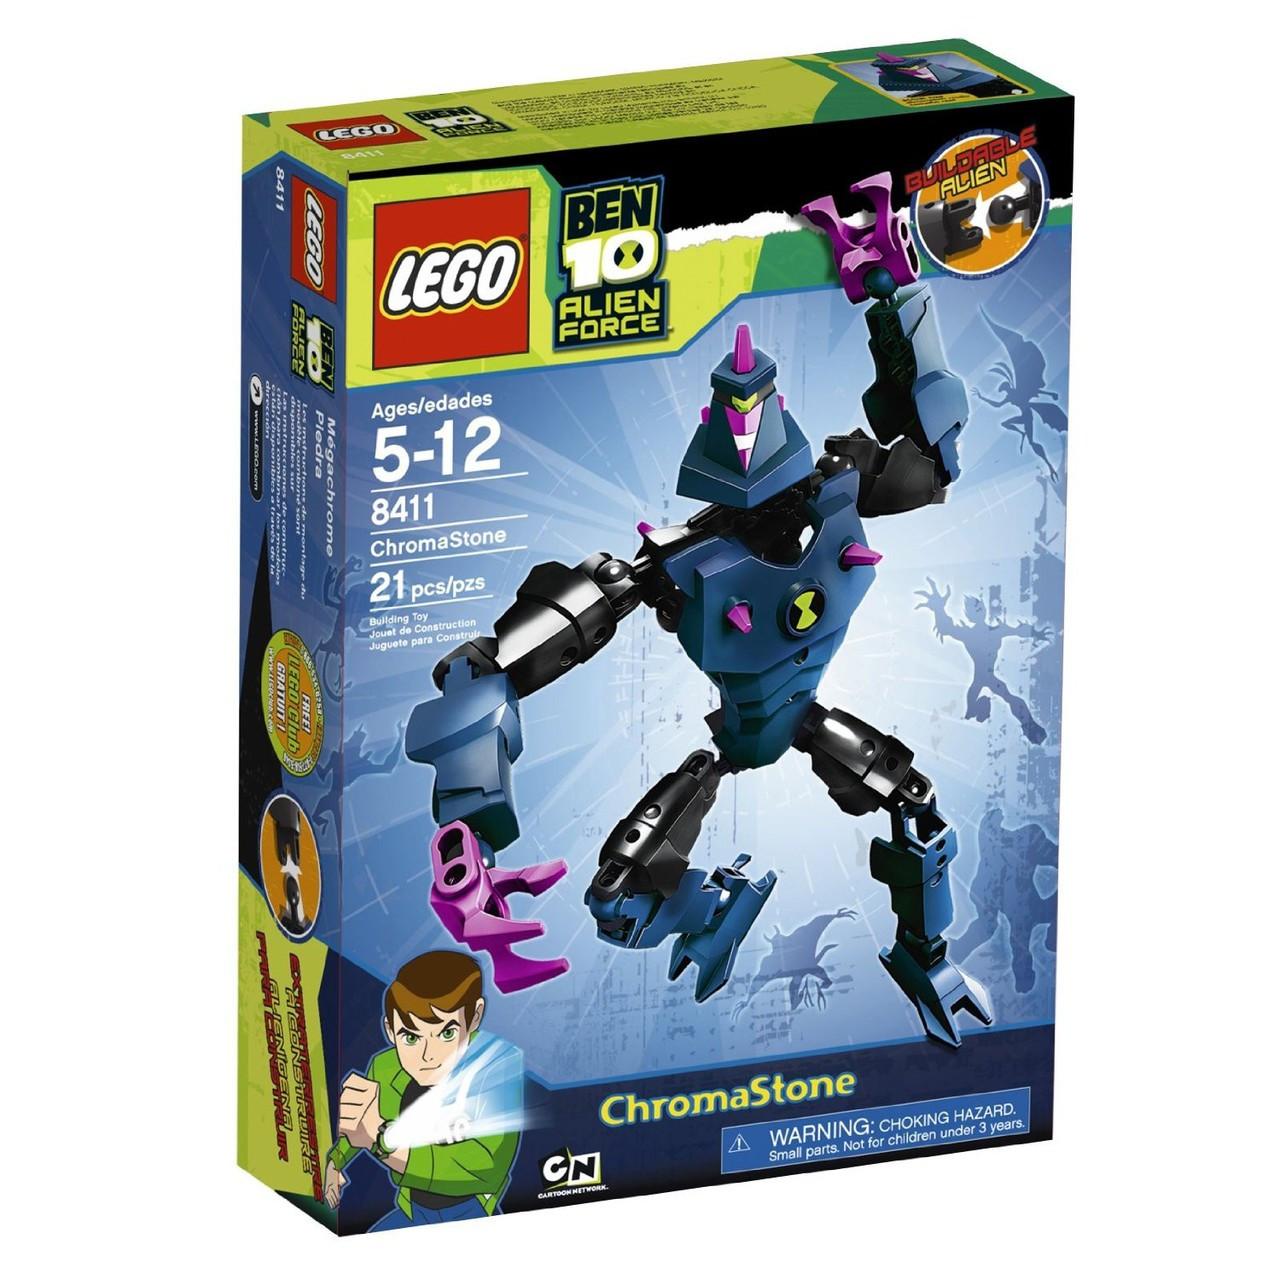 LEGO Ben 10 Alien Force Figures Chromastone Set #8411